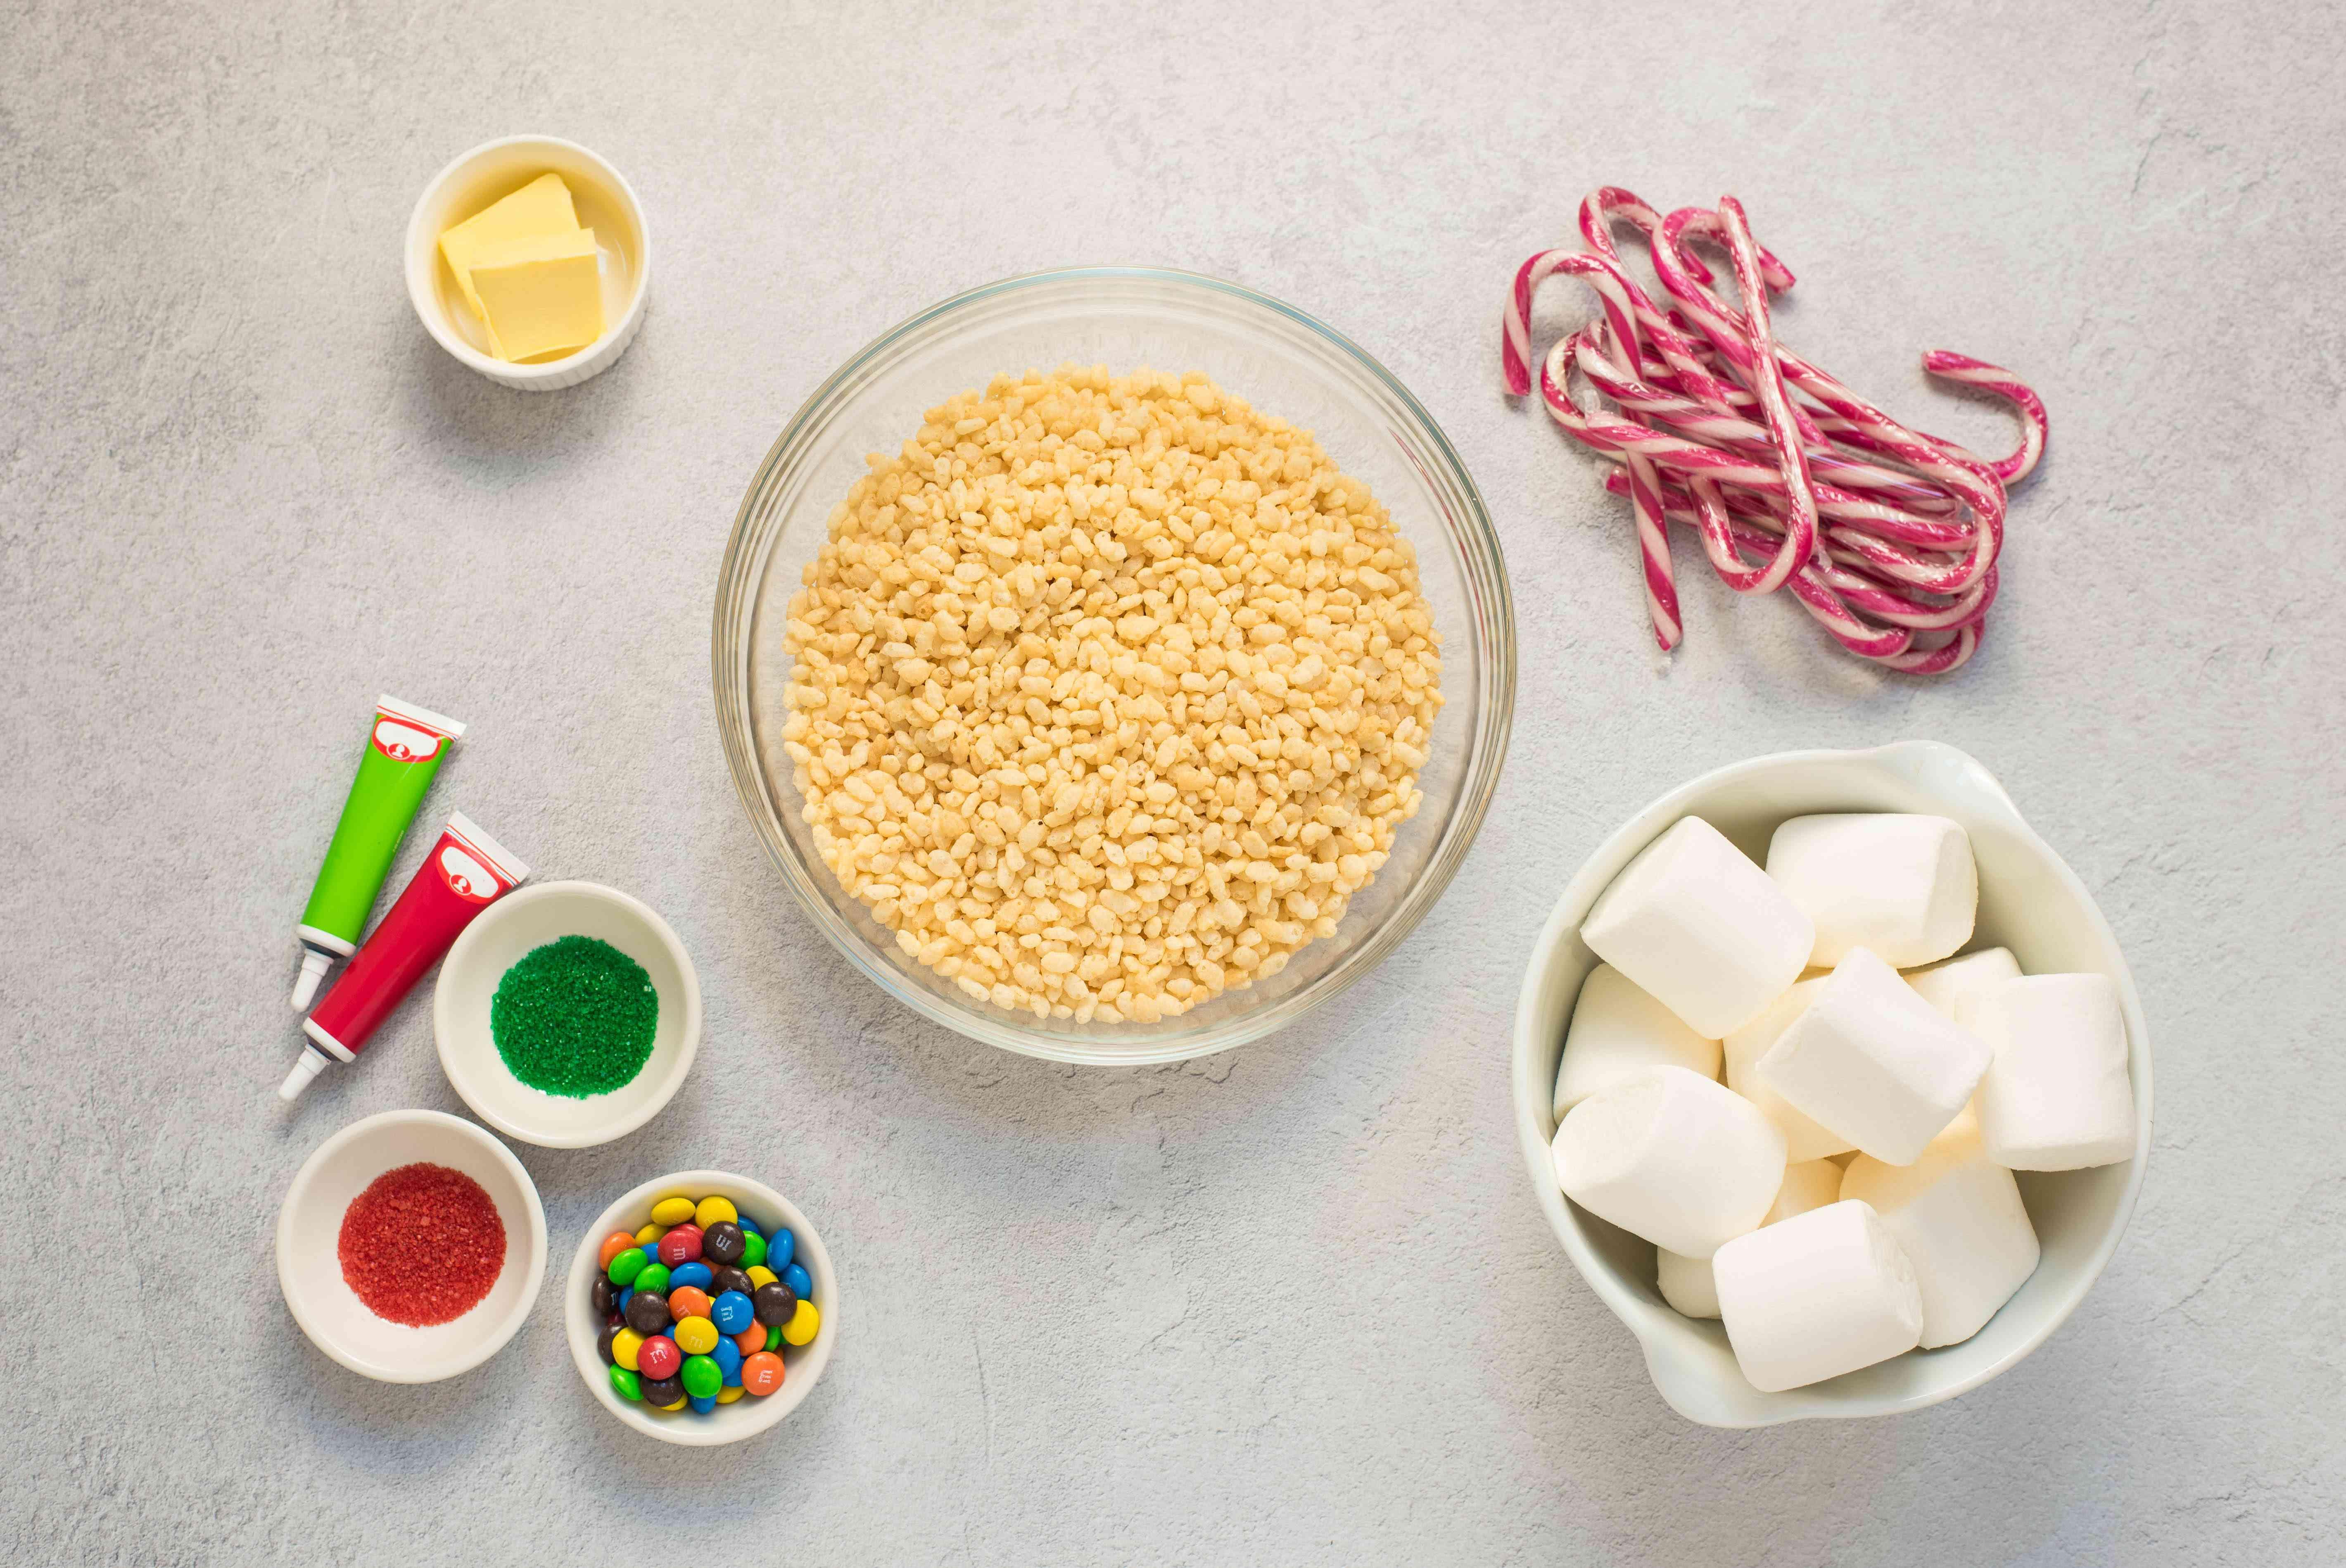 Ingredients for rice crispy treats